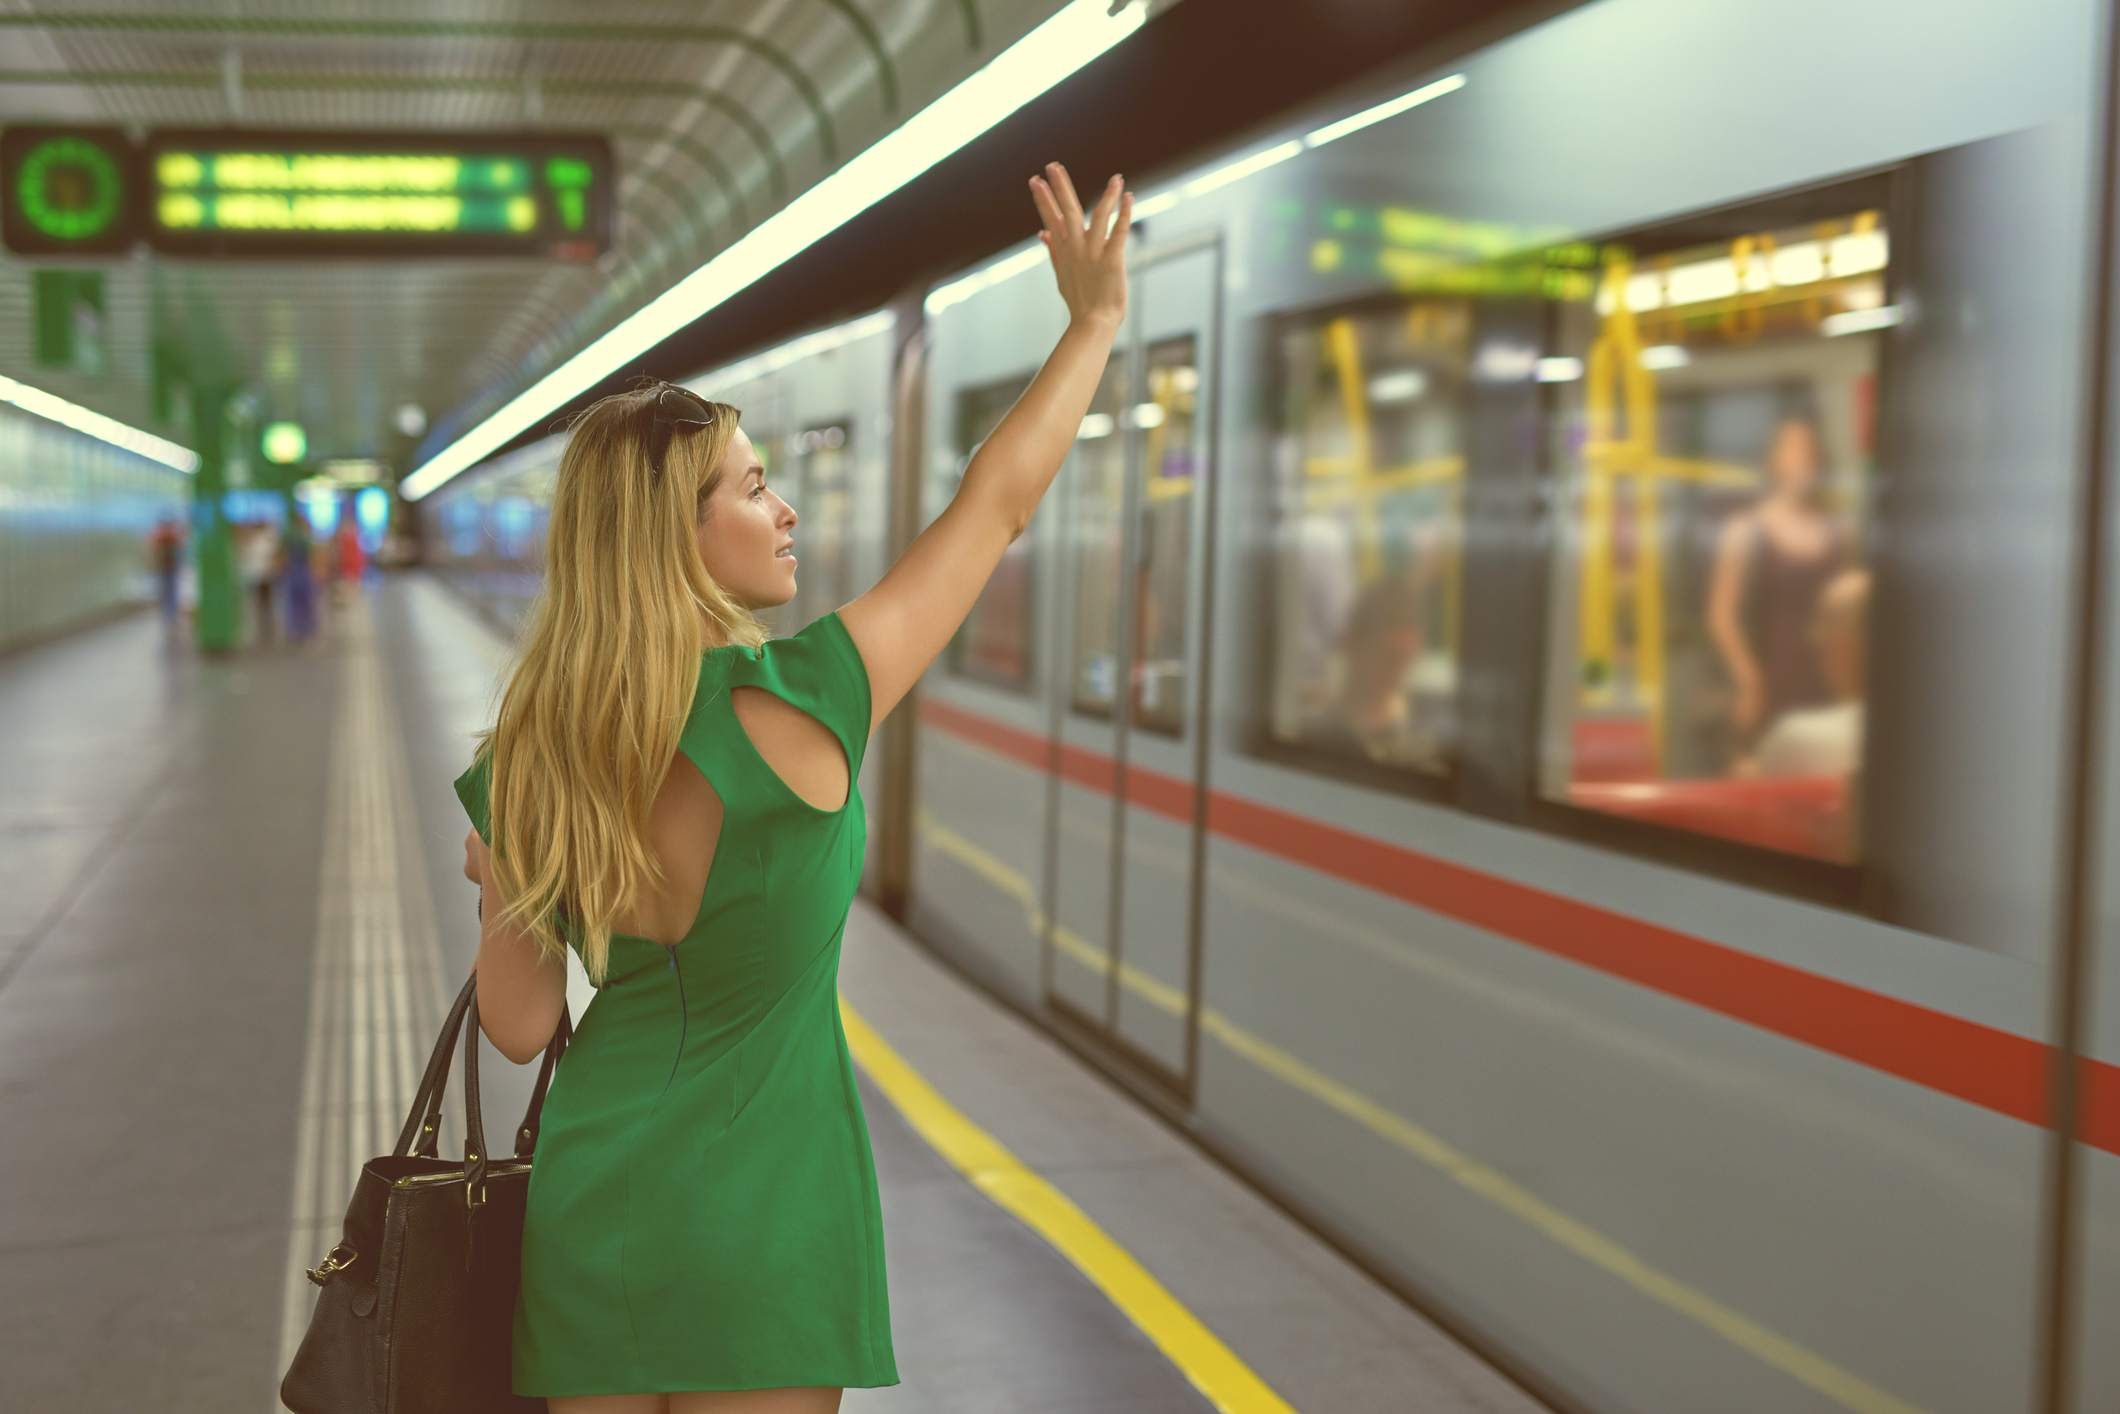 Woman waving to train at station